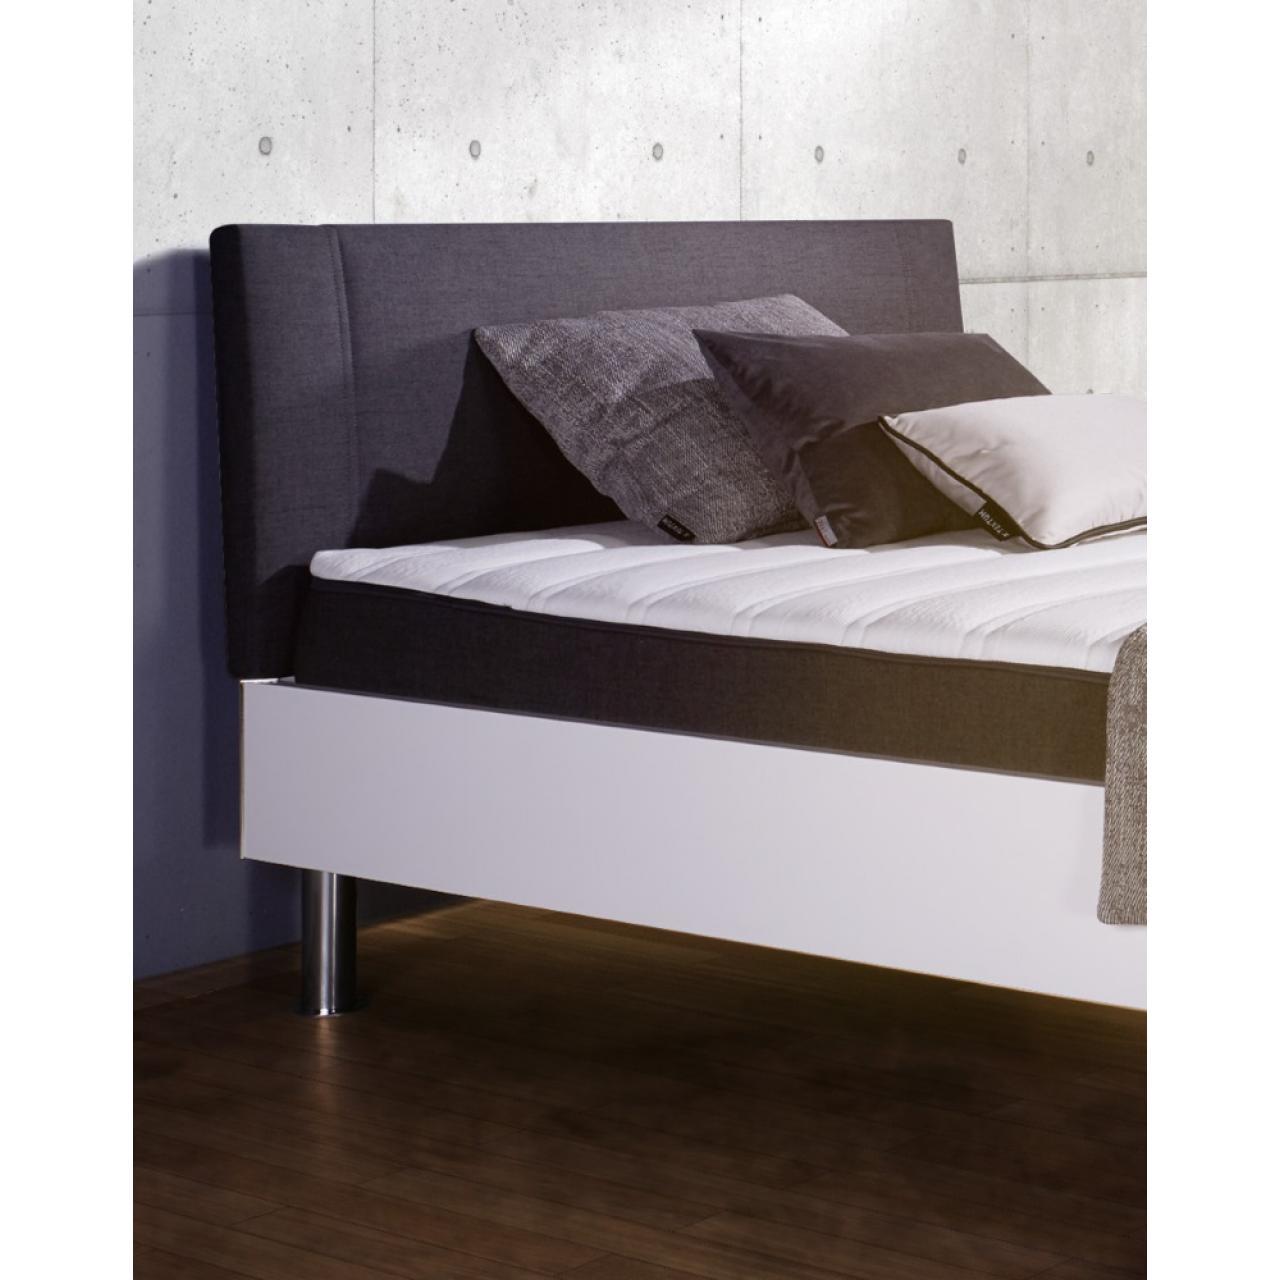 boxbett anton 140x200 cm anthrazit wei m bel. Black Bedroom Furniture Sets. Home Design Ideas